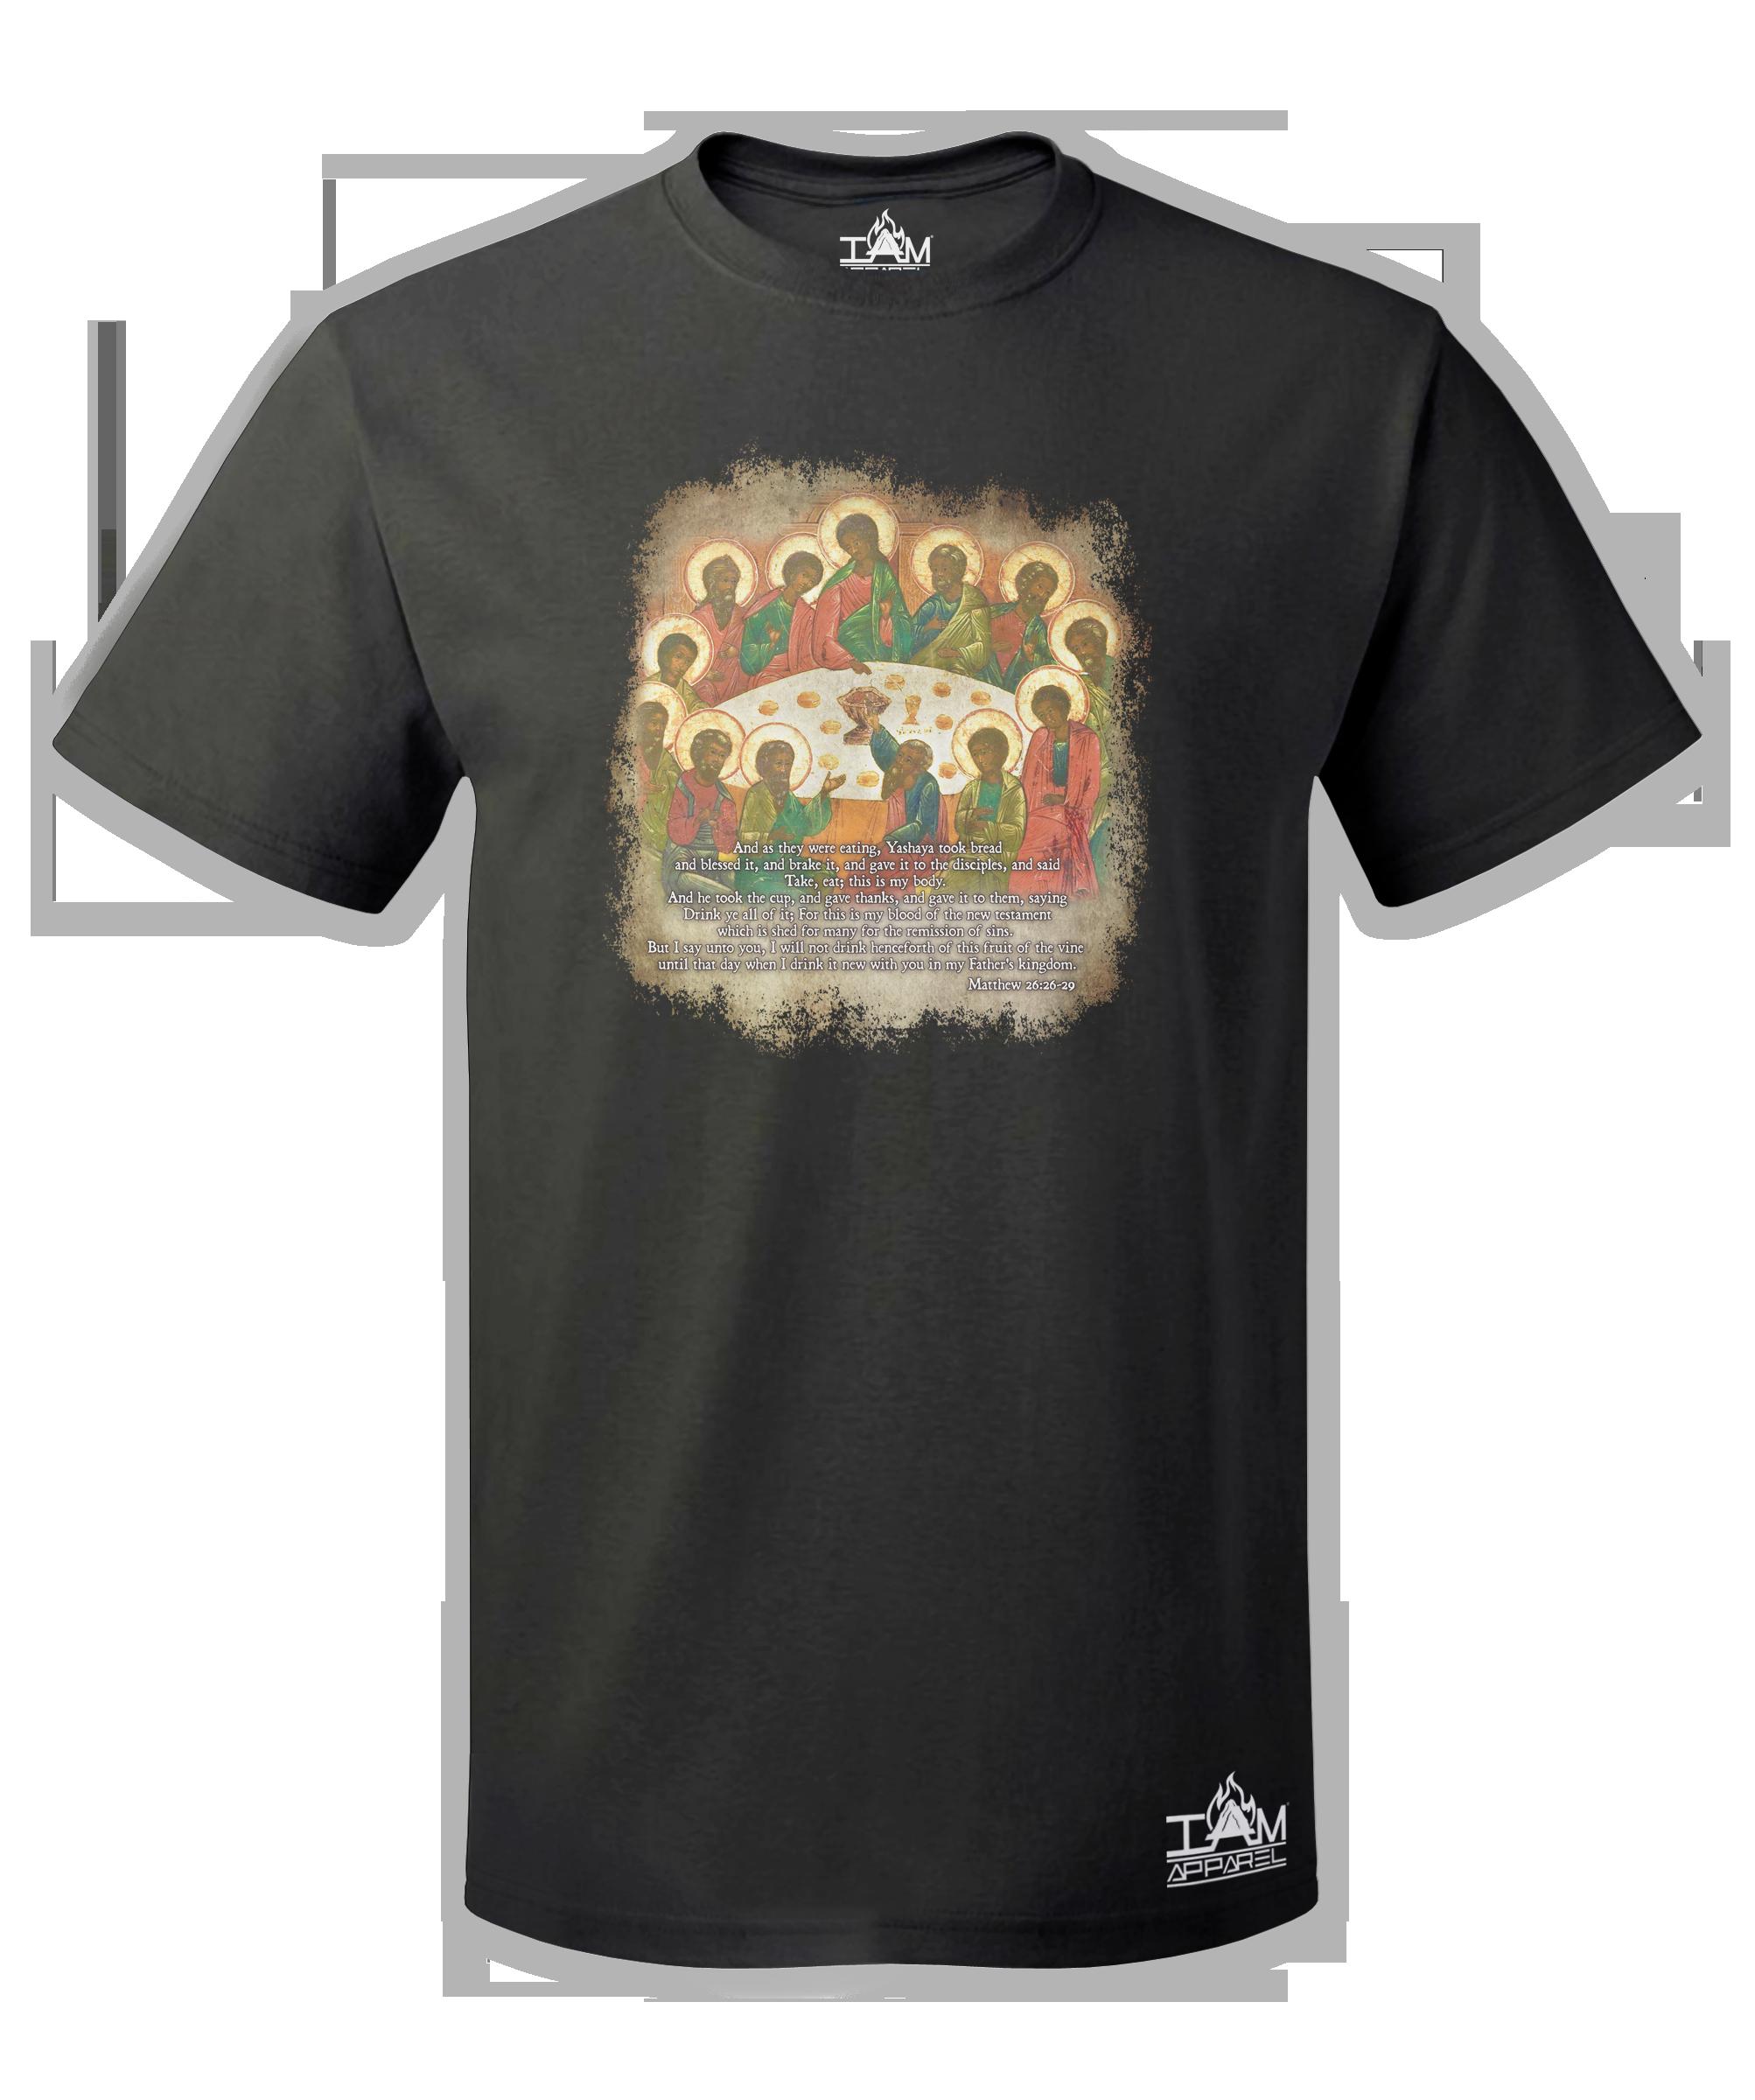 The Last Supper Men's  Short Sleeved T-shirt